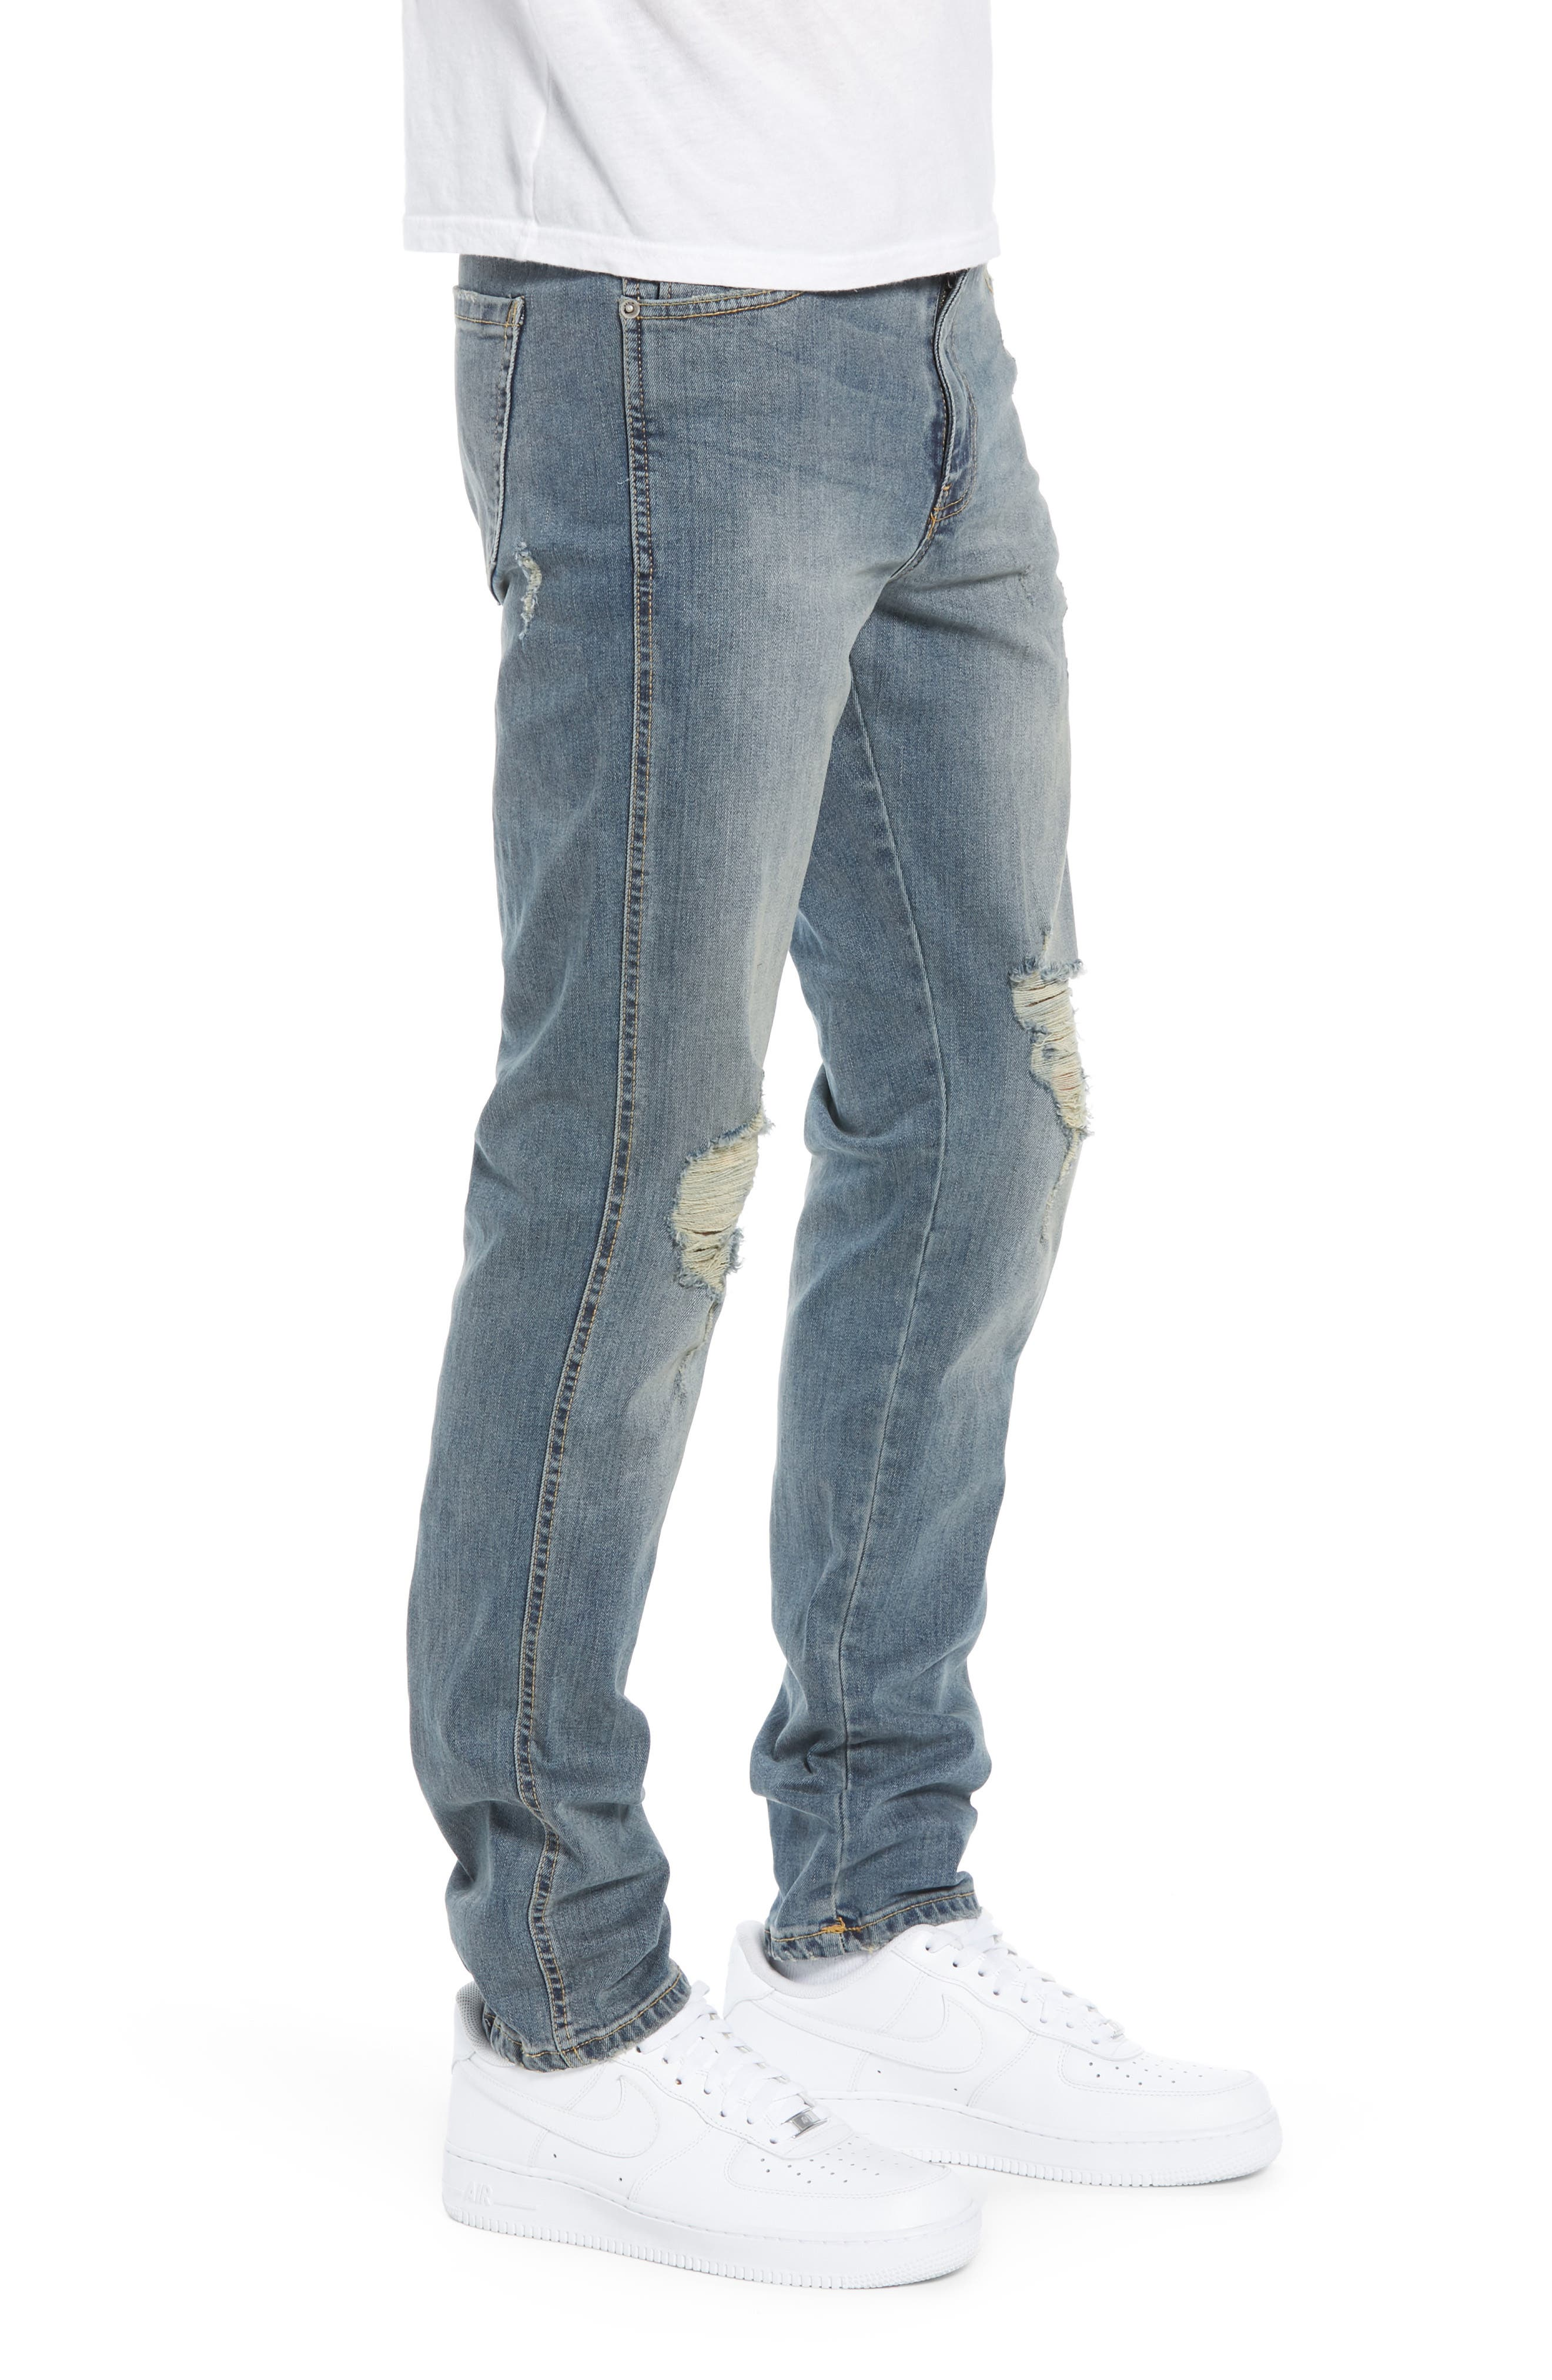 Snap Skinny Fit Jeans,                             Alternate thumbnail 3, color,                             LIGHT OLD DESTROY